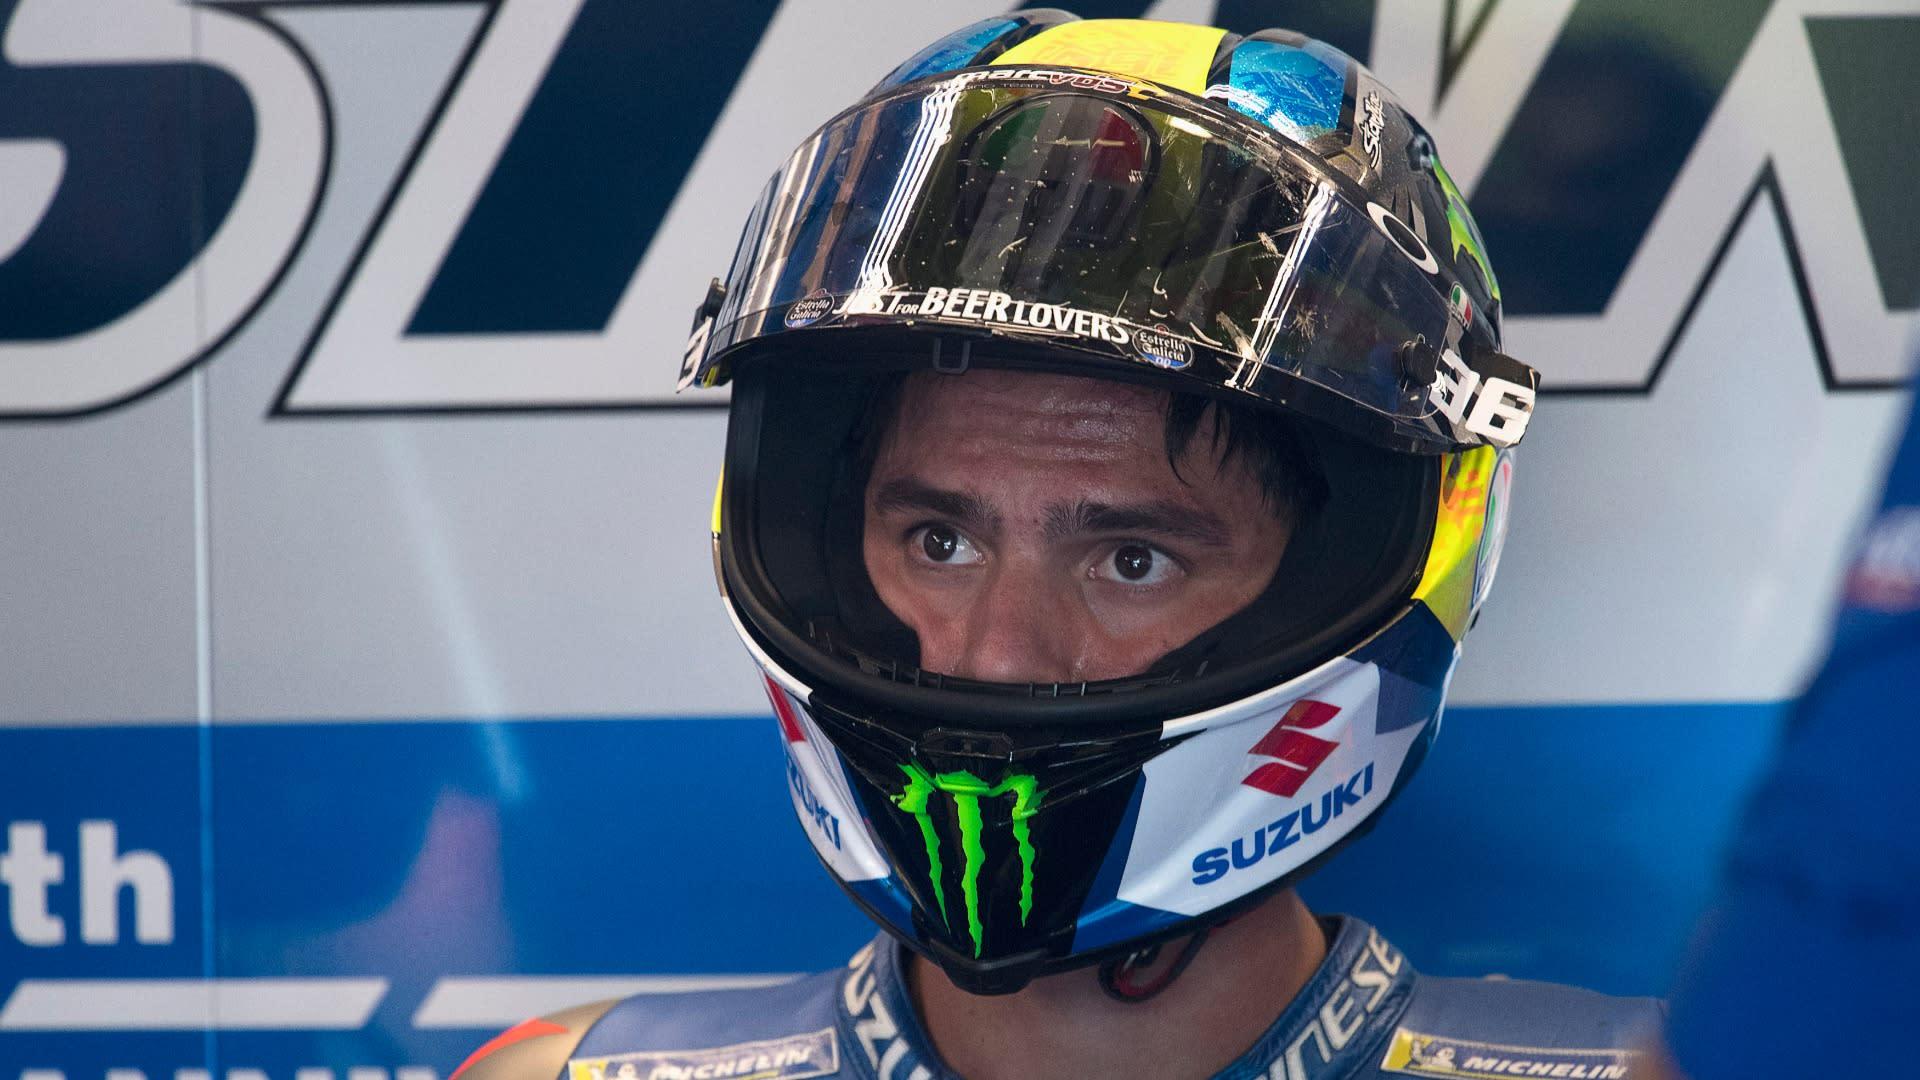 Motogp 2020 Espargaro And Miller Sympathise With Mir